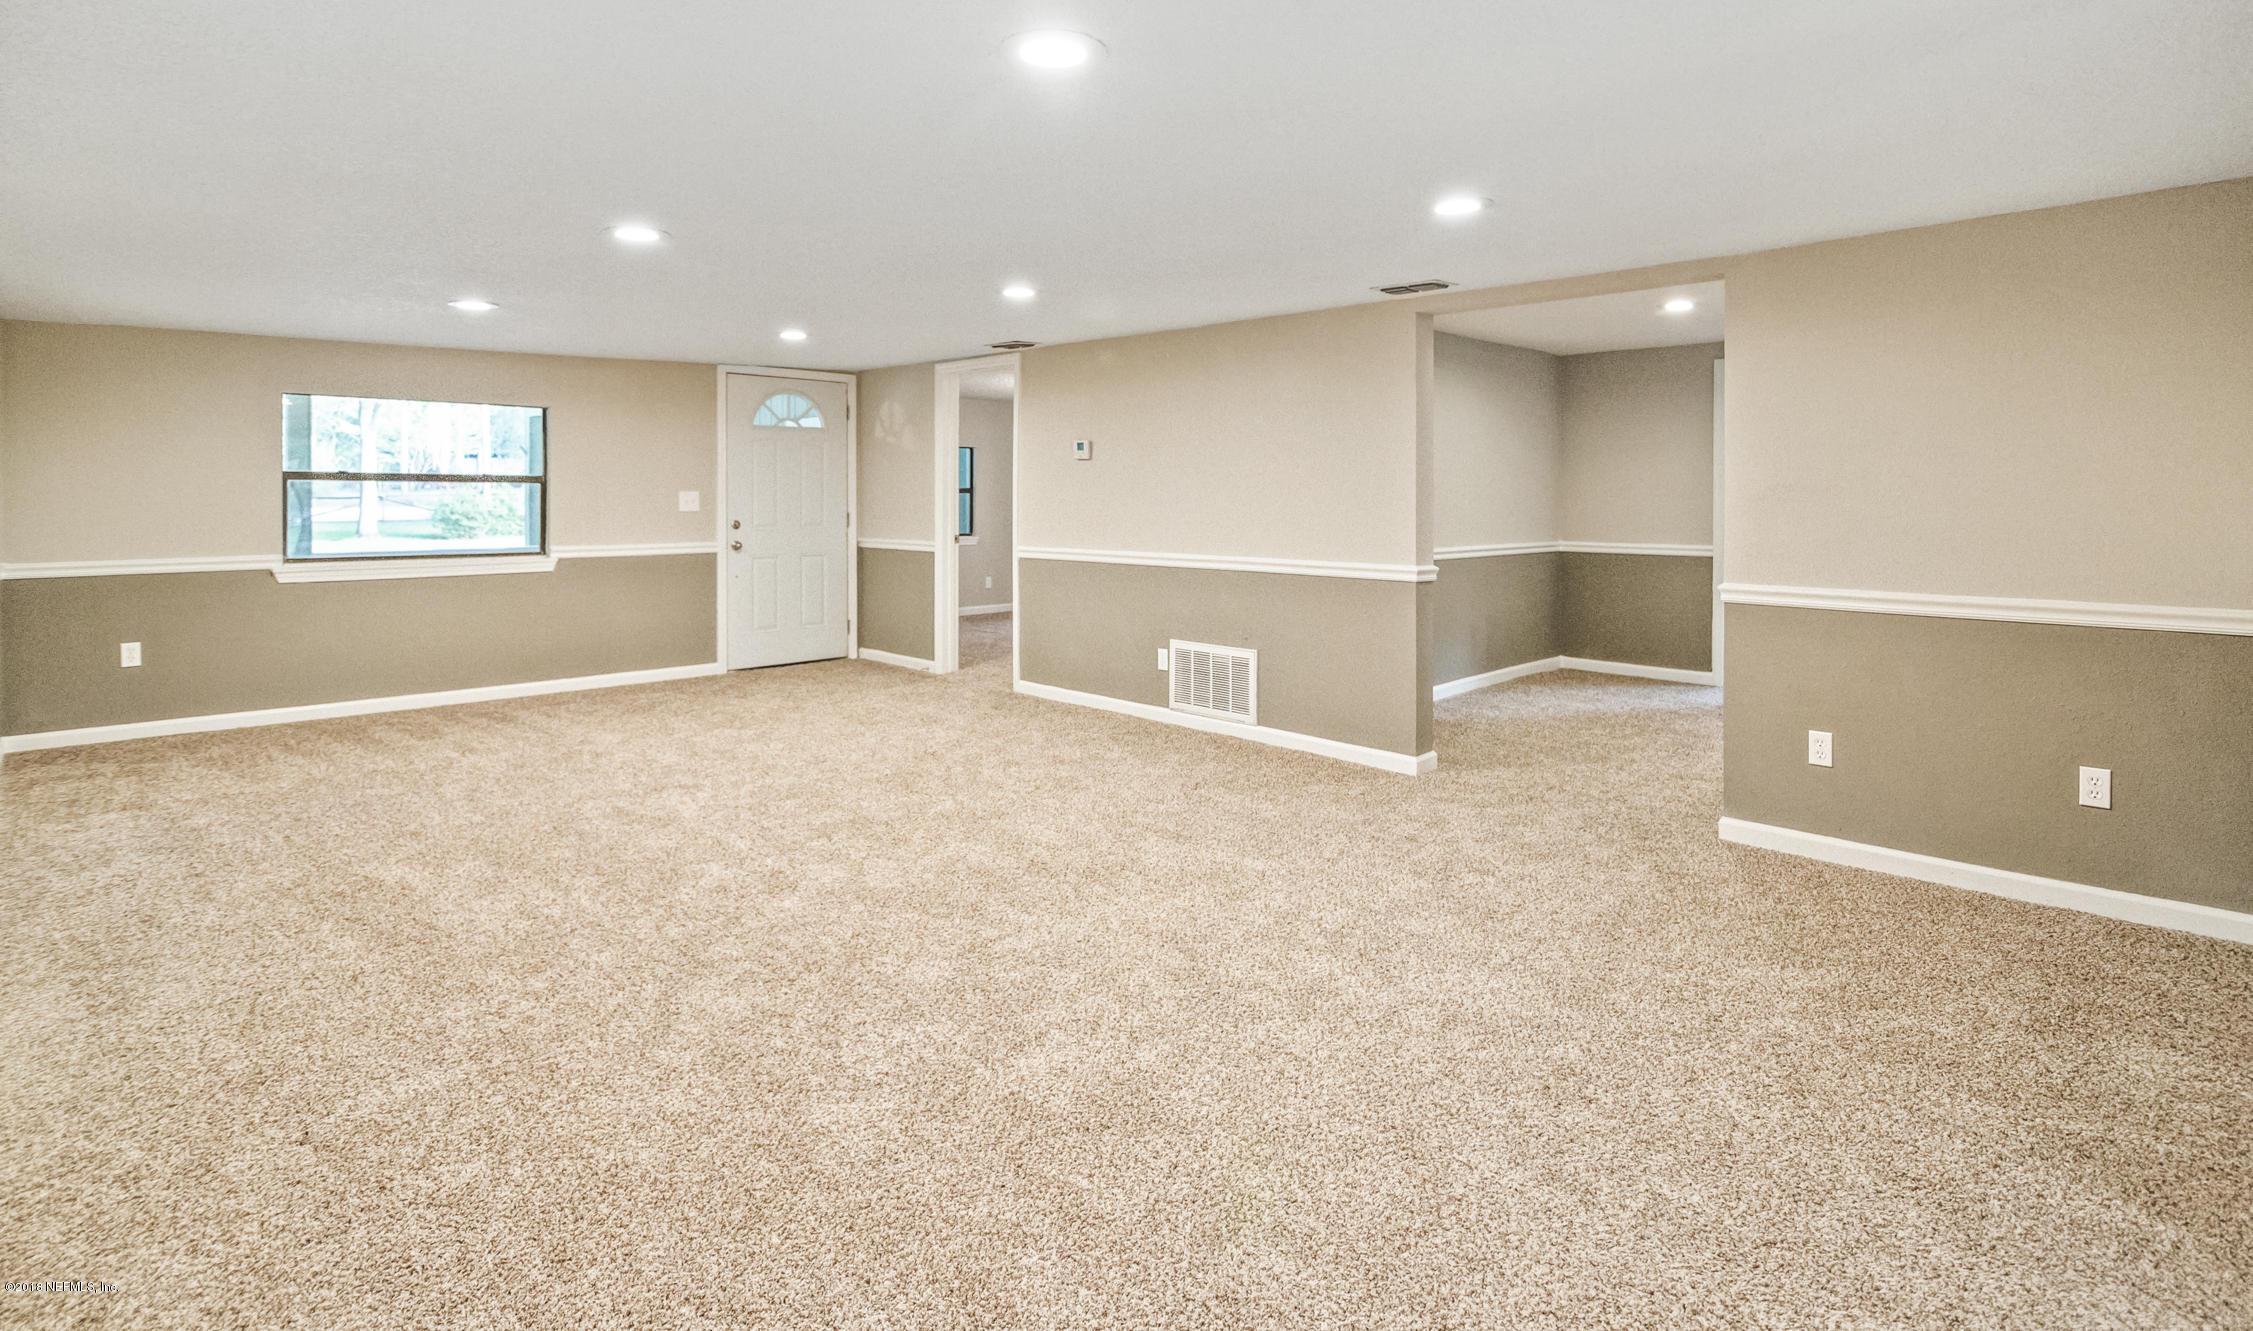 2926 BLACK CREEK, MIDDLEBURG, FLORIDA 32068, 3 Bedrooms Bedrooms, ,2 BathroomsBathrooms,Residential - single family,For sale,BLACK CREEK,967372